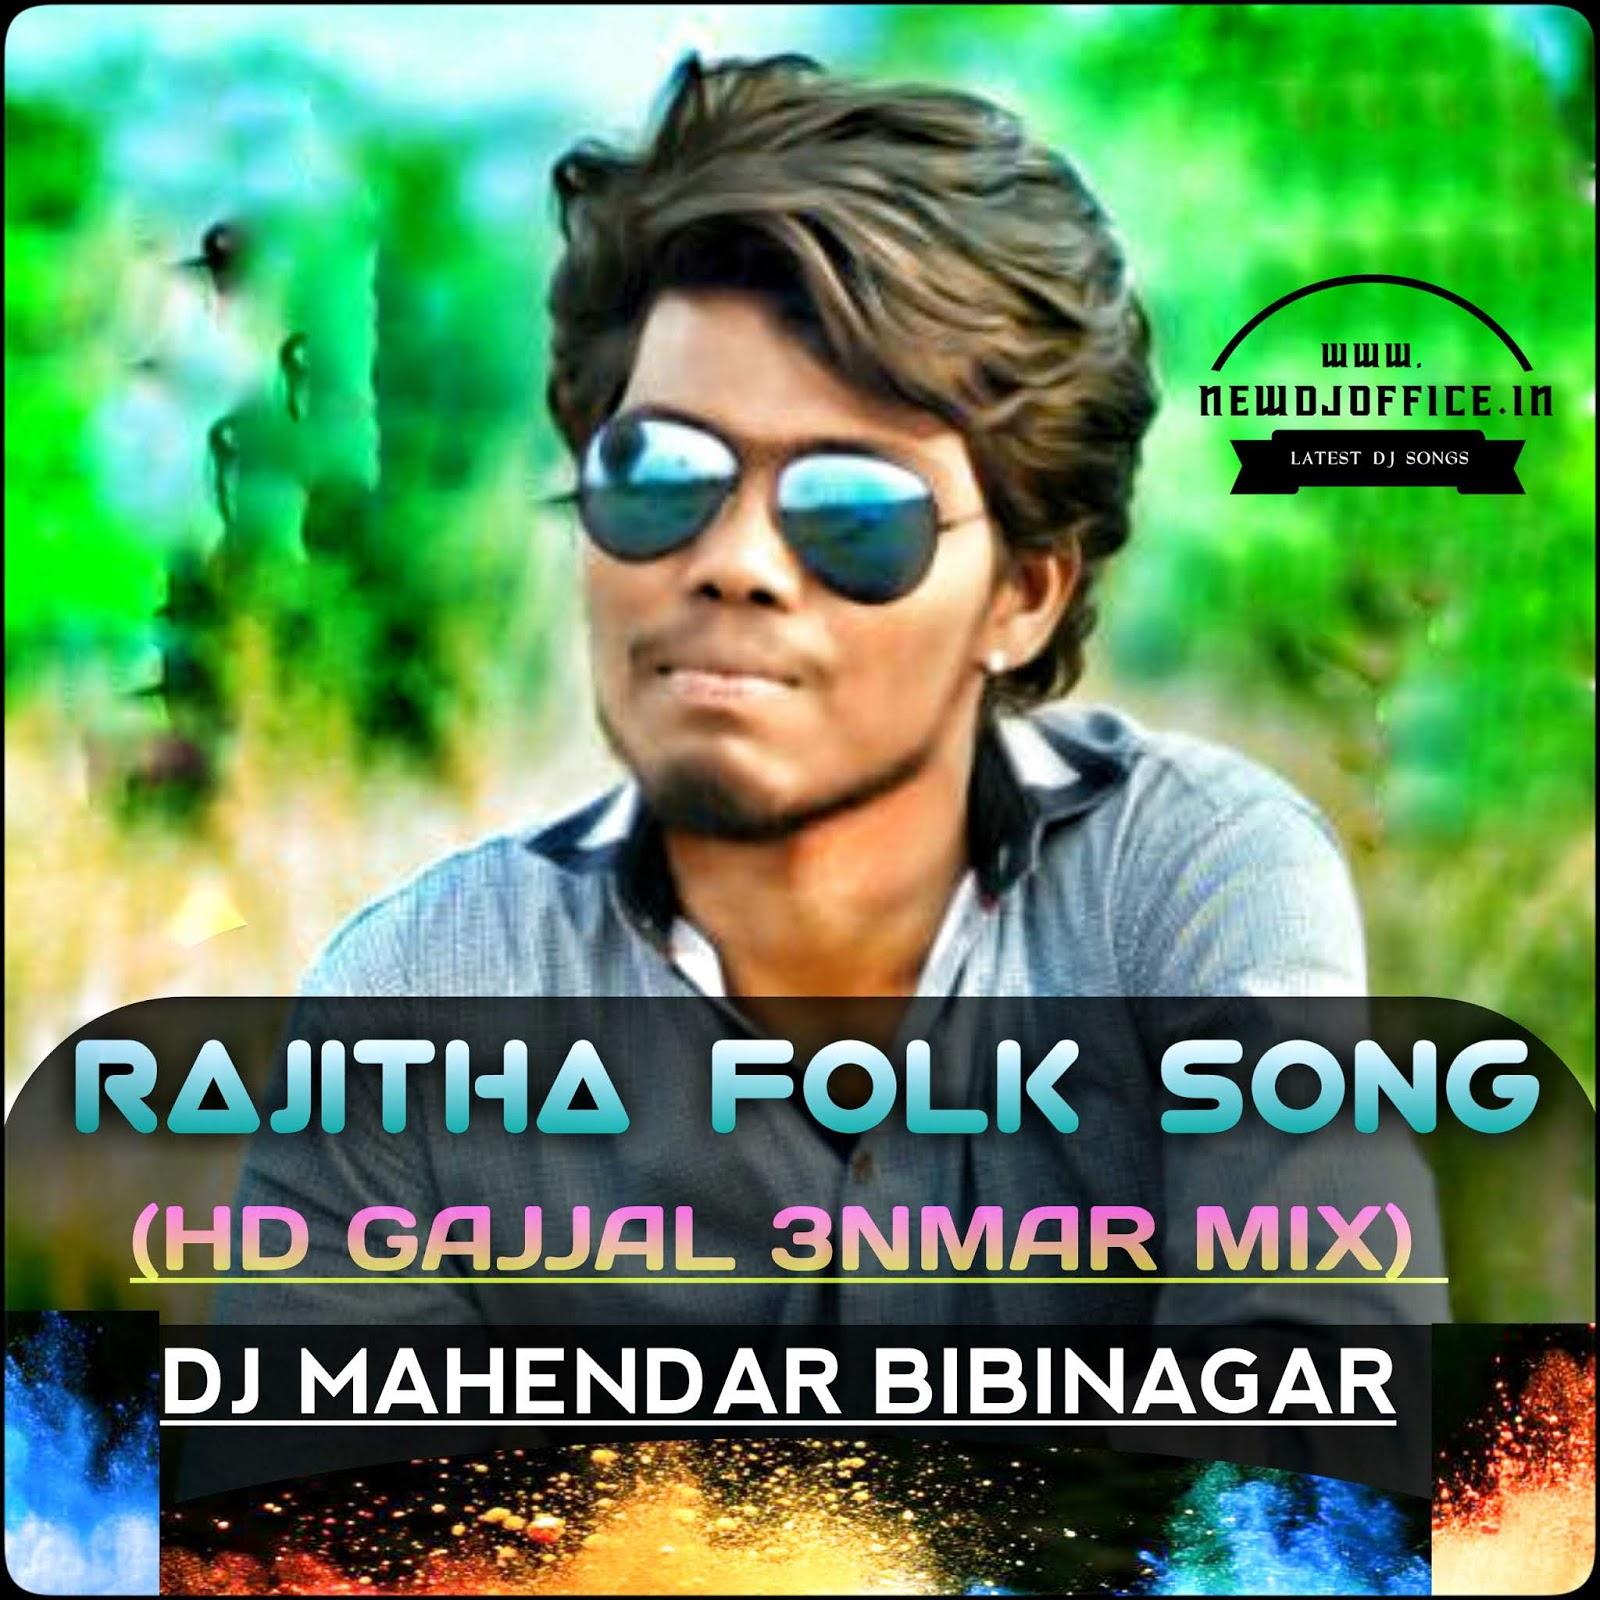 Rajitha new telugu dj song download | Download New Dj Songs